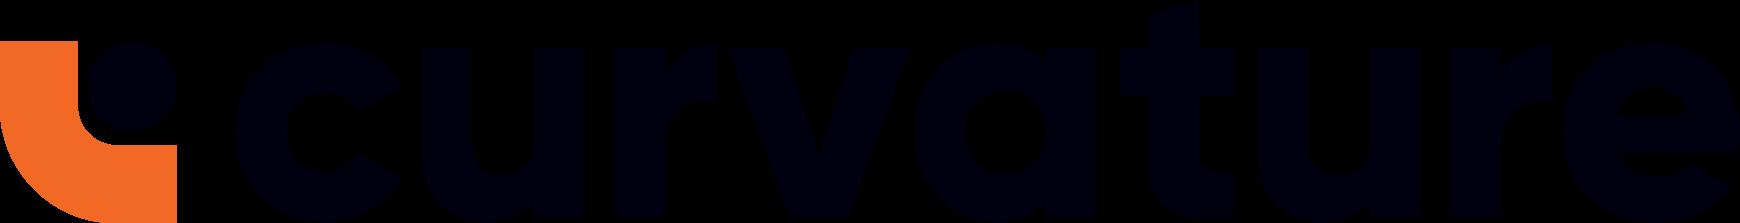 Curvature logo